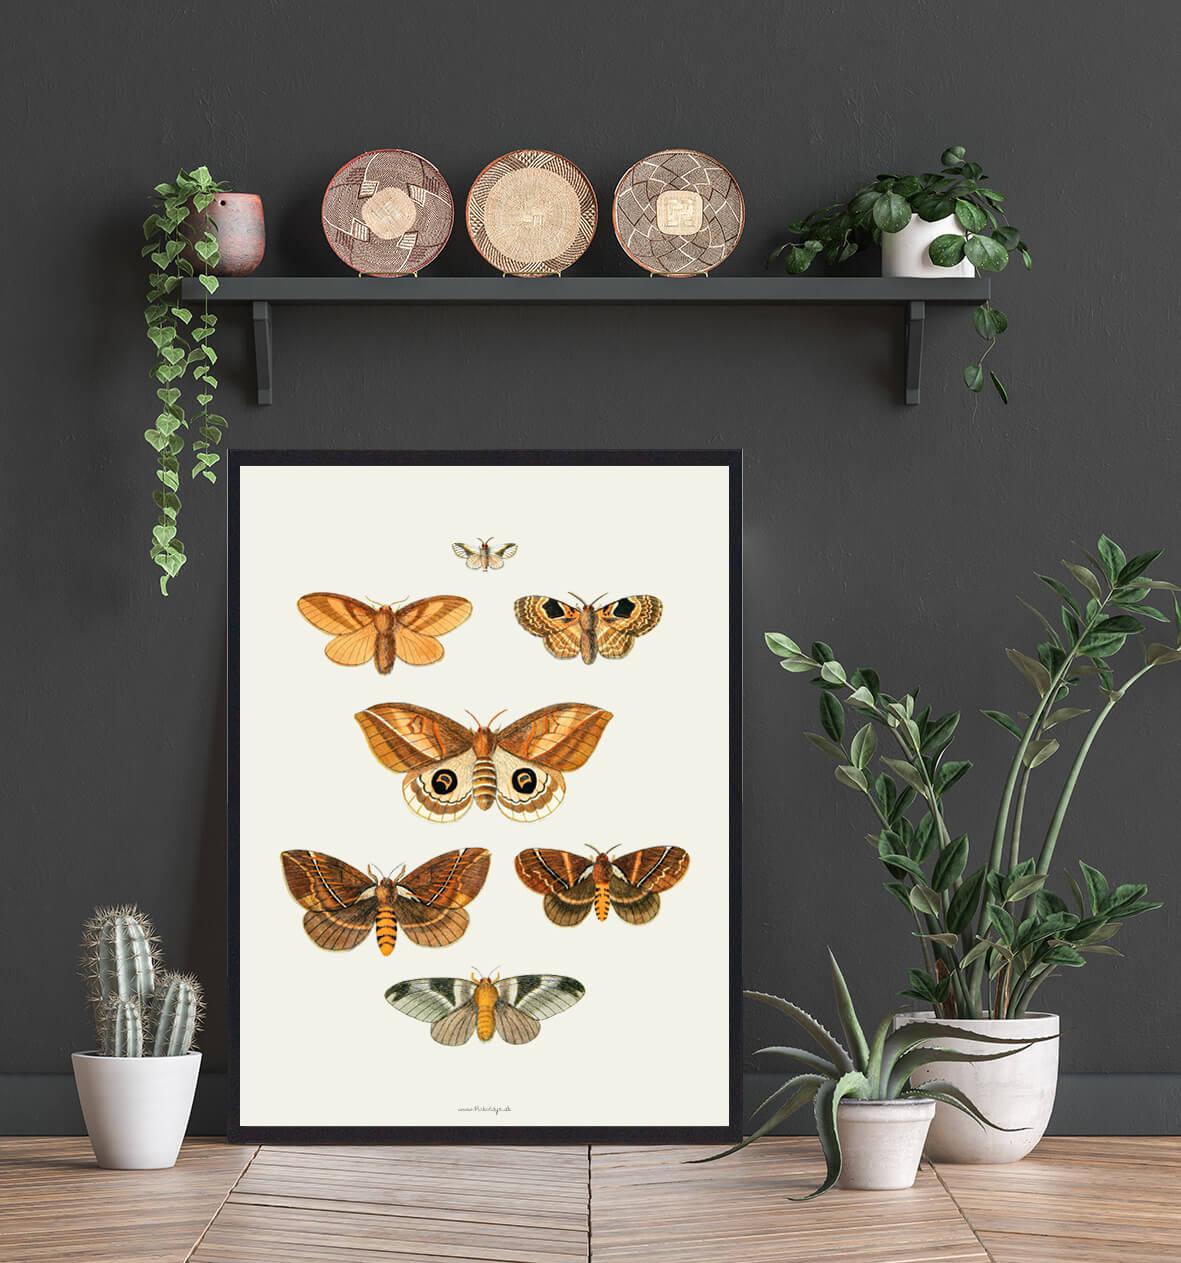 plakat-sommerfugle-boligindretning-3